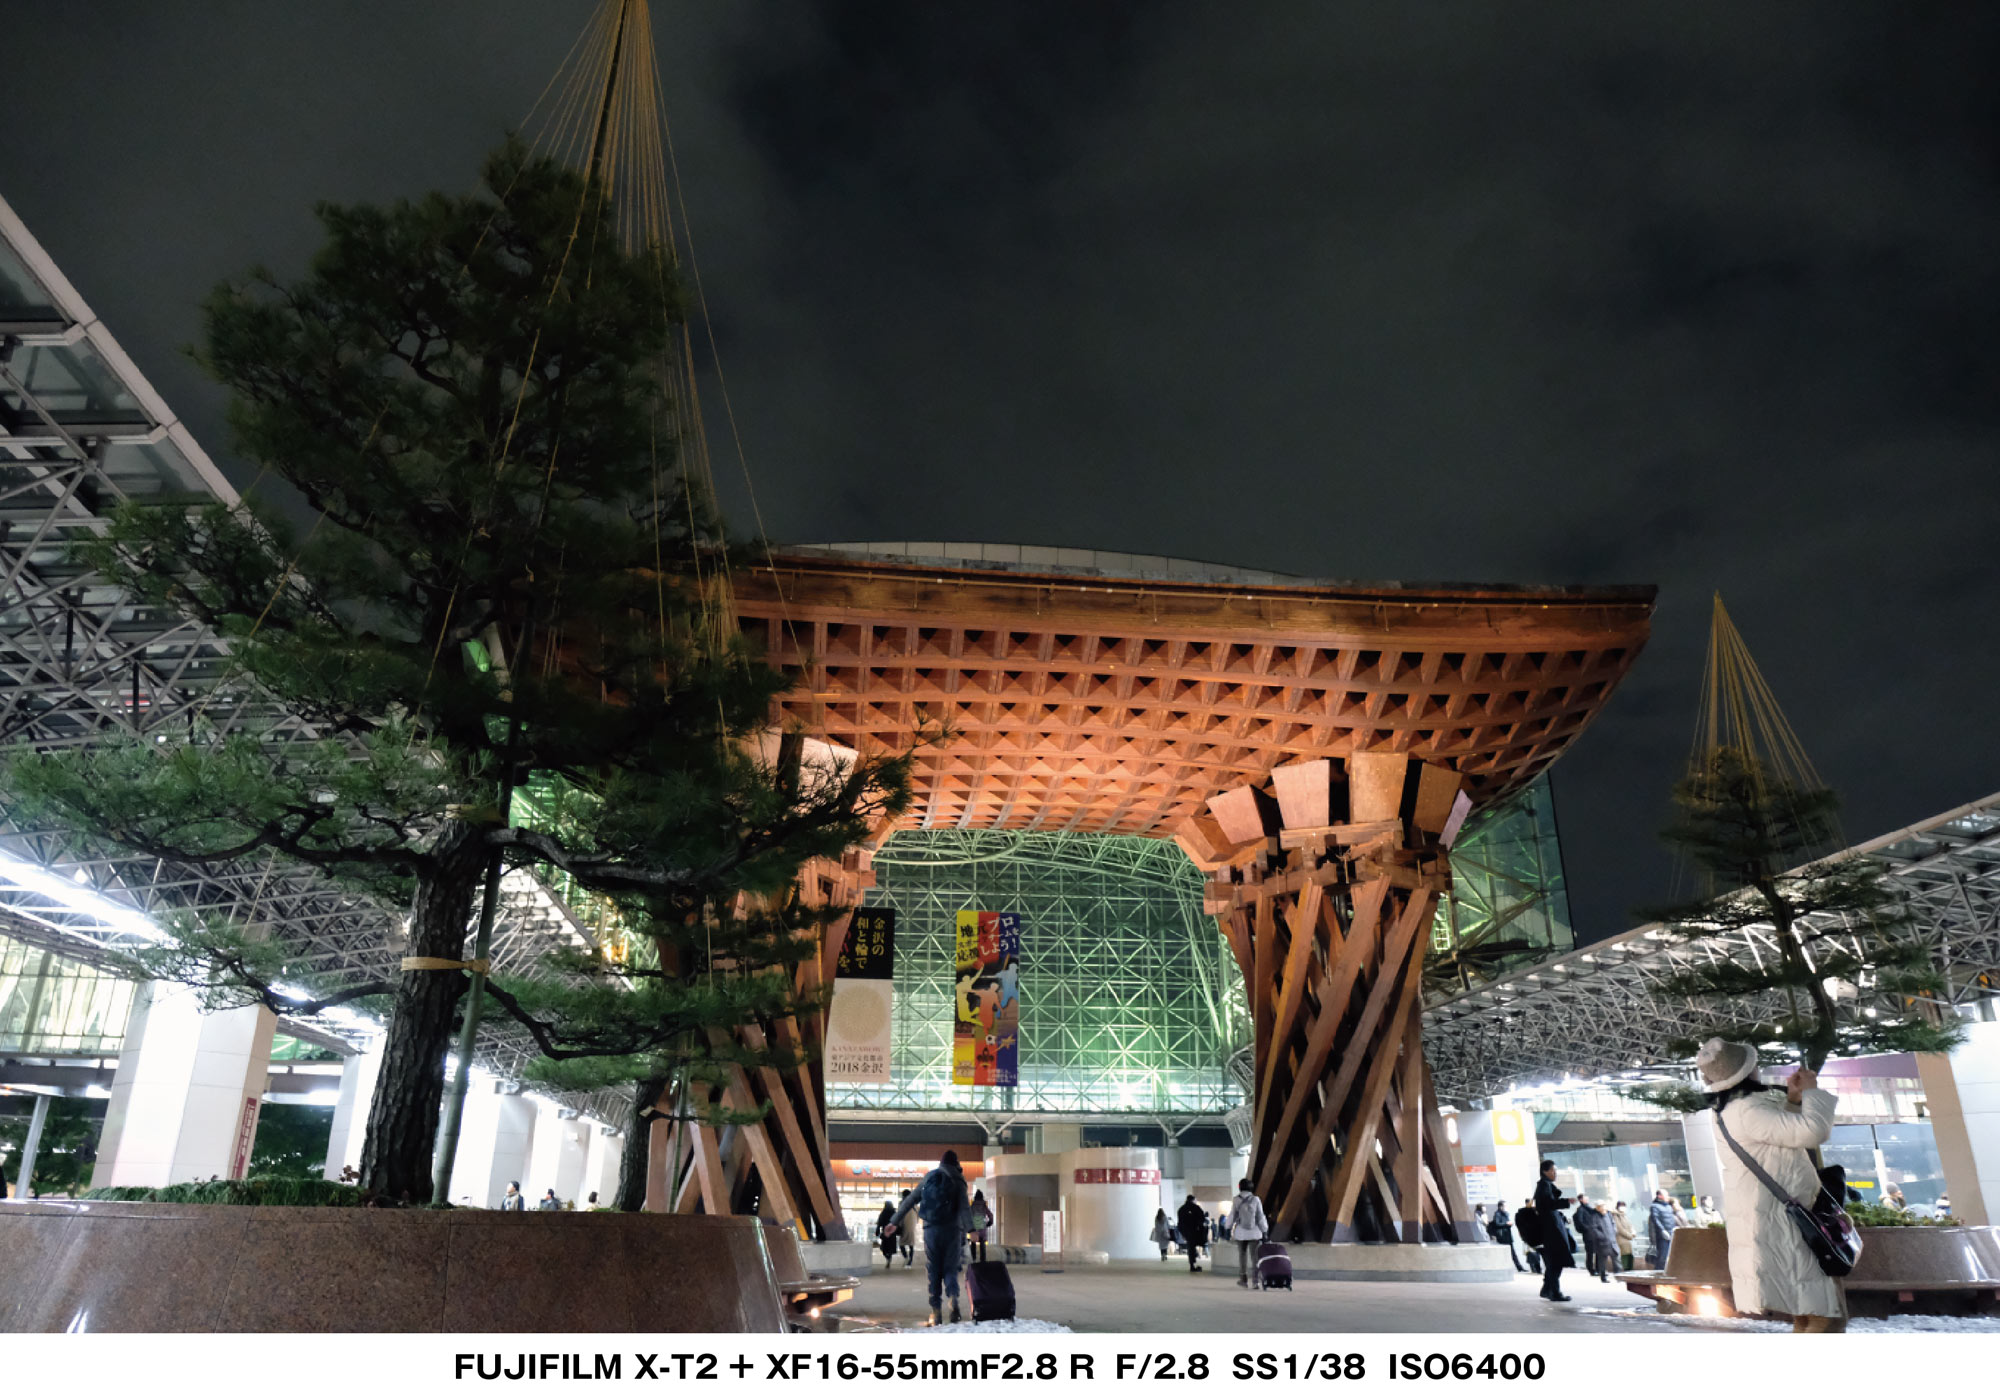 X-T2 金沢駅 夜の鼓門